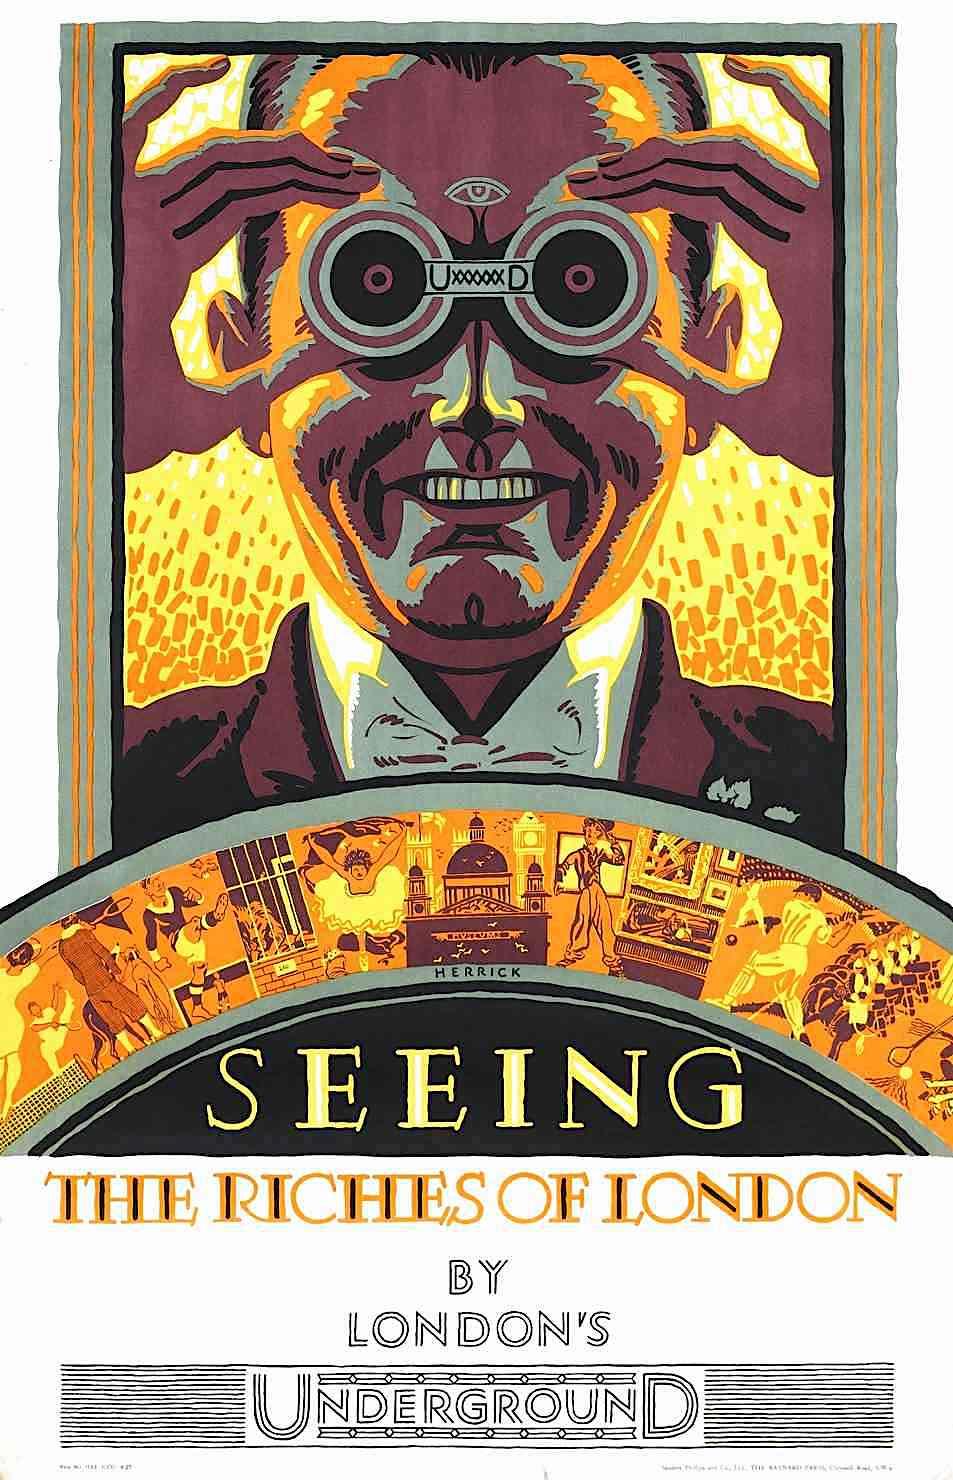 a Frederick C. Herrick 1927 London subway poster